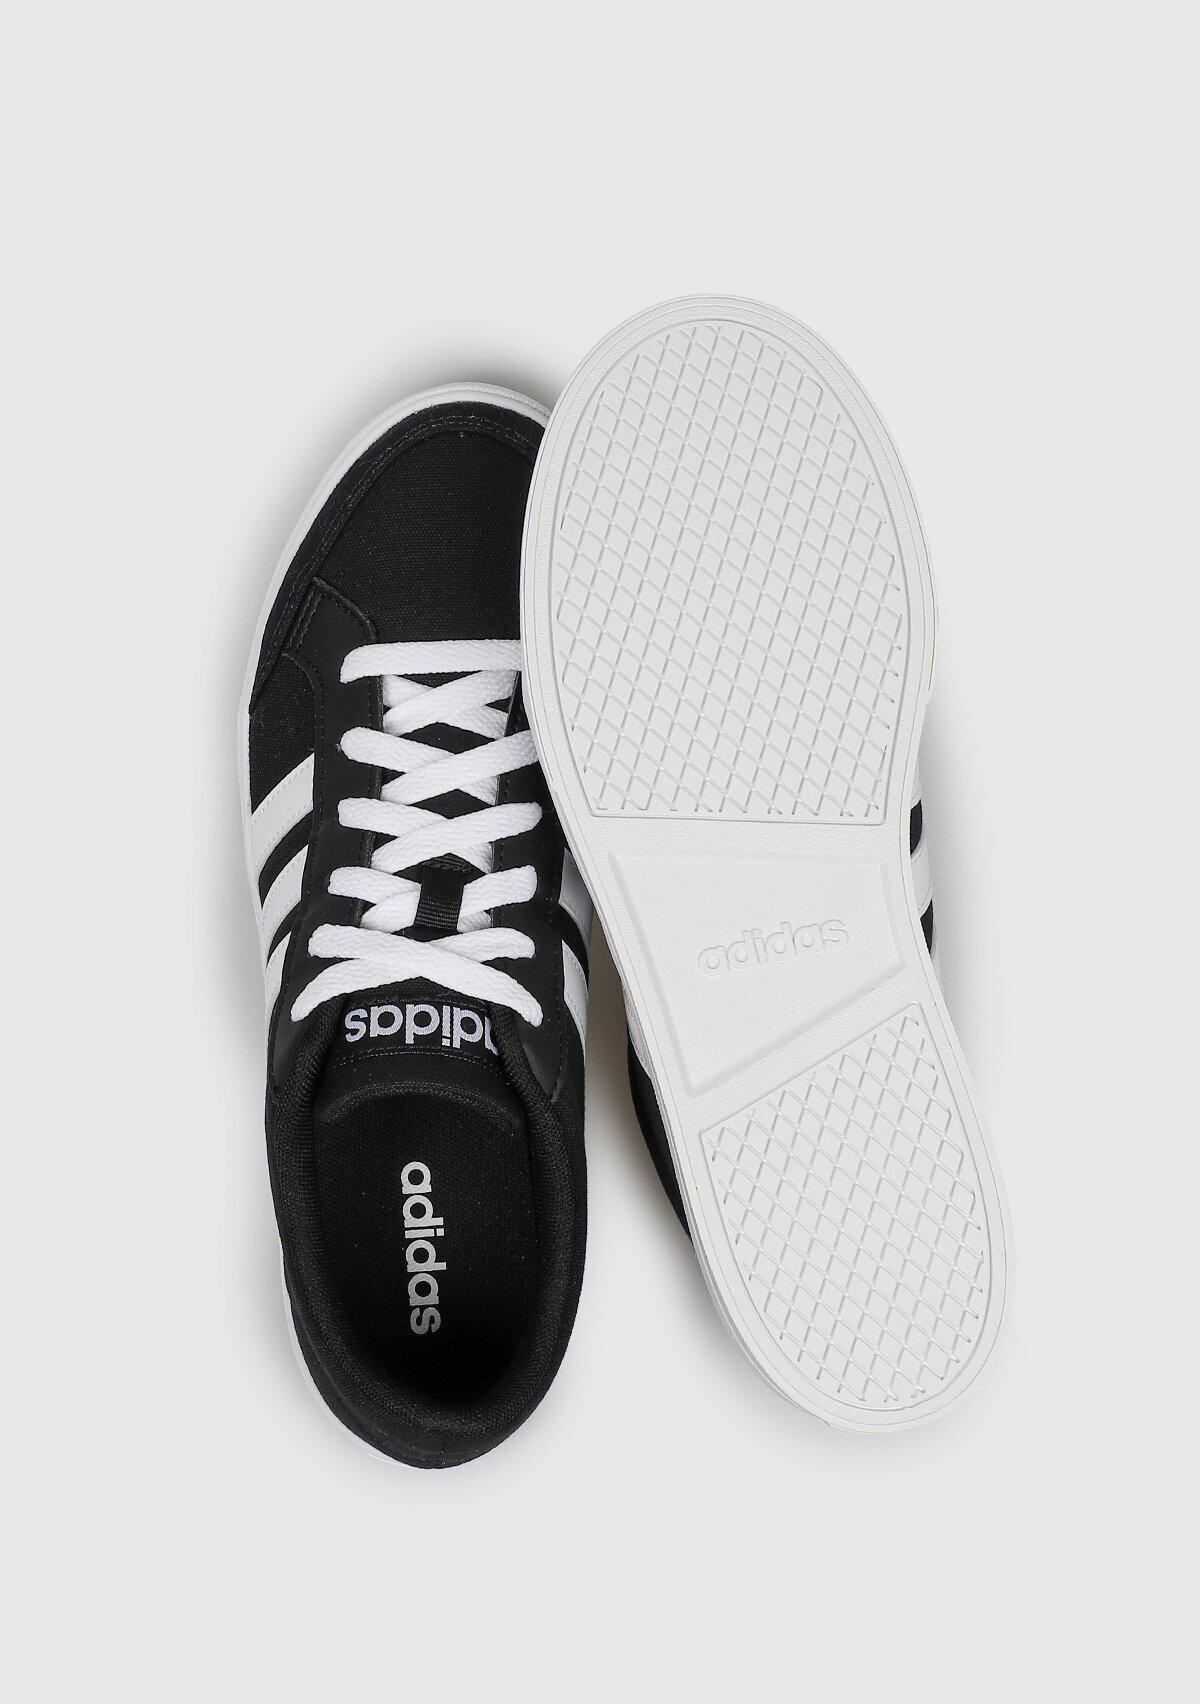 resm Vs Set Siyah Erkek Tenis Ayakkabısı Aw3890